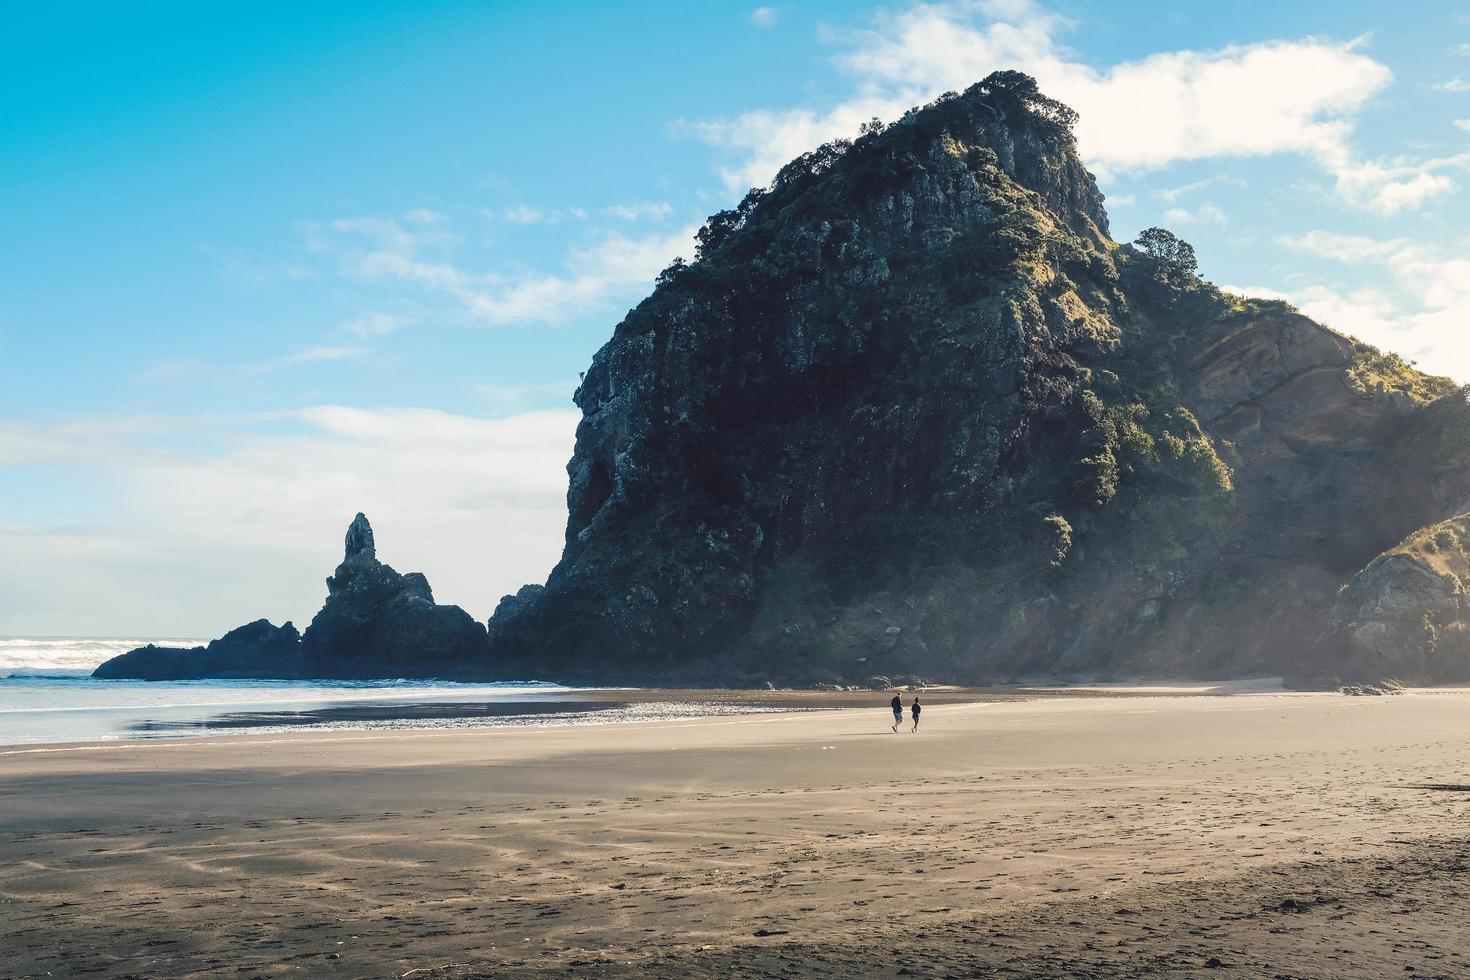 Two people on seashore near mountain photo